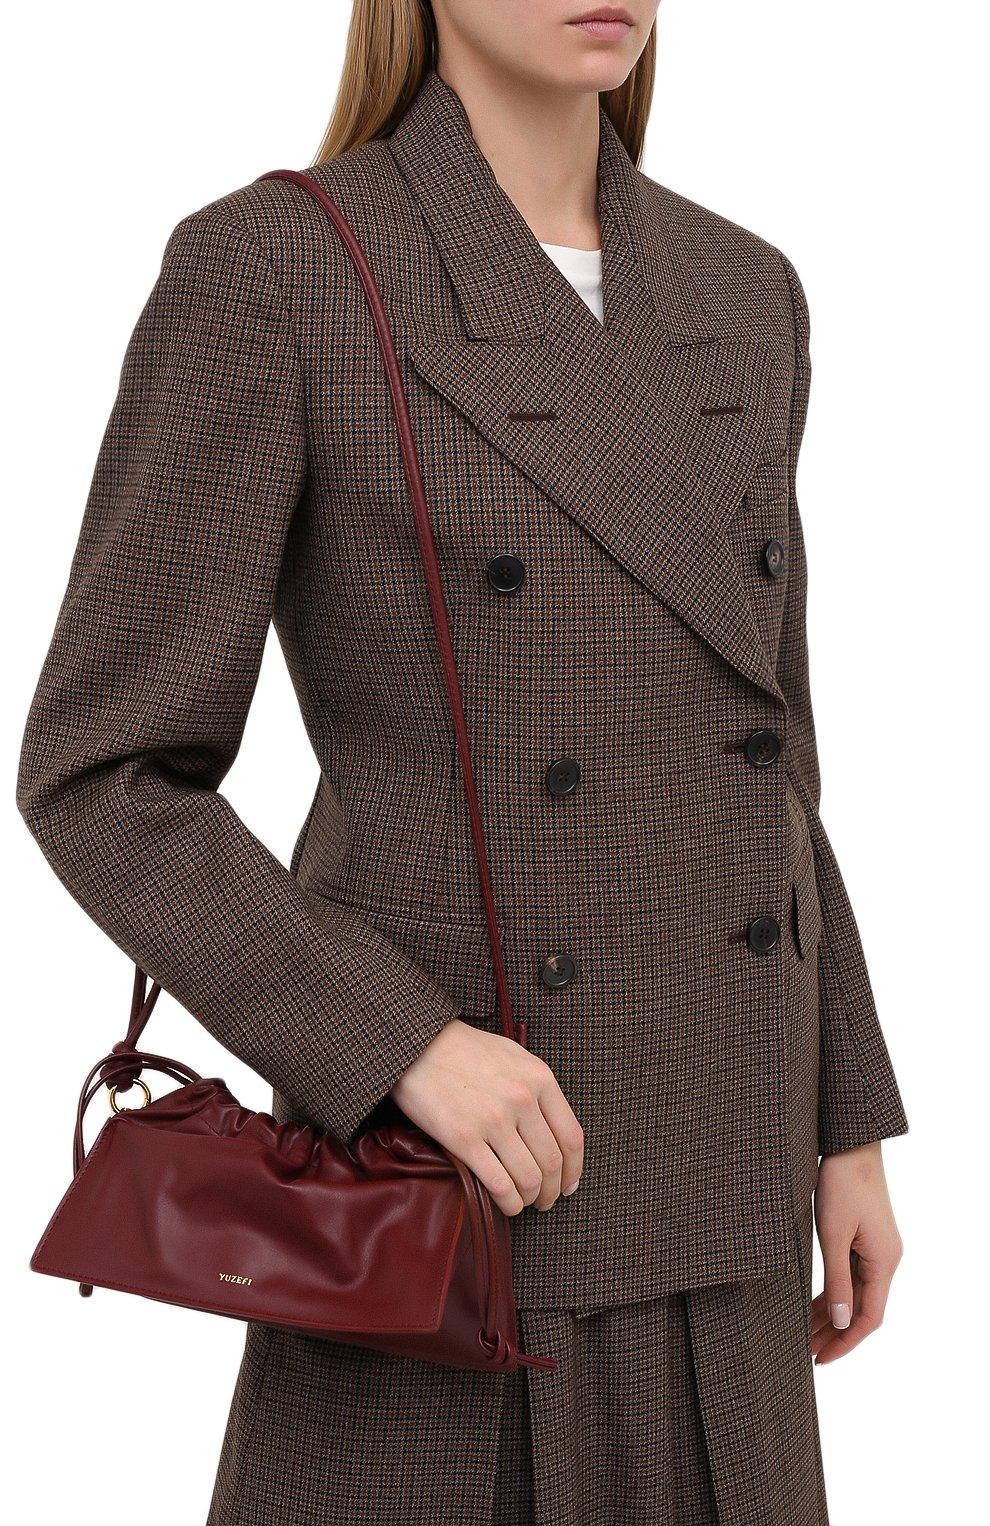 Женская сумка bom mini YUZEFI бордового цвета, арт. YUZAW20-HB-B0-02 | Фото 5 (Сумки-технические: Сумки через плечо, Сумки top-handle; Материал: Натуральная кожа; Размер: mini; Ремень/цепочка: На ремешке)